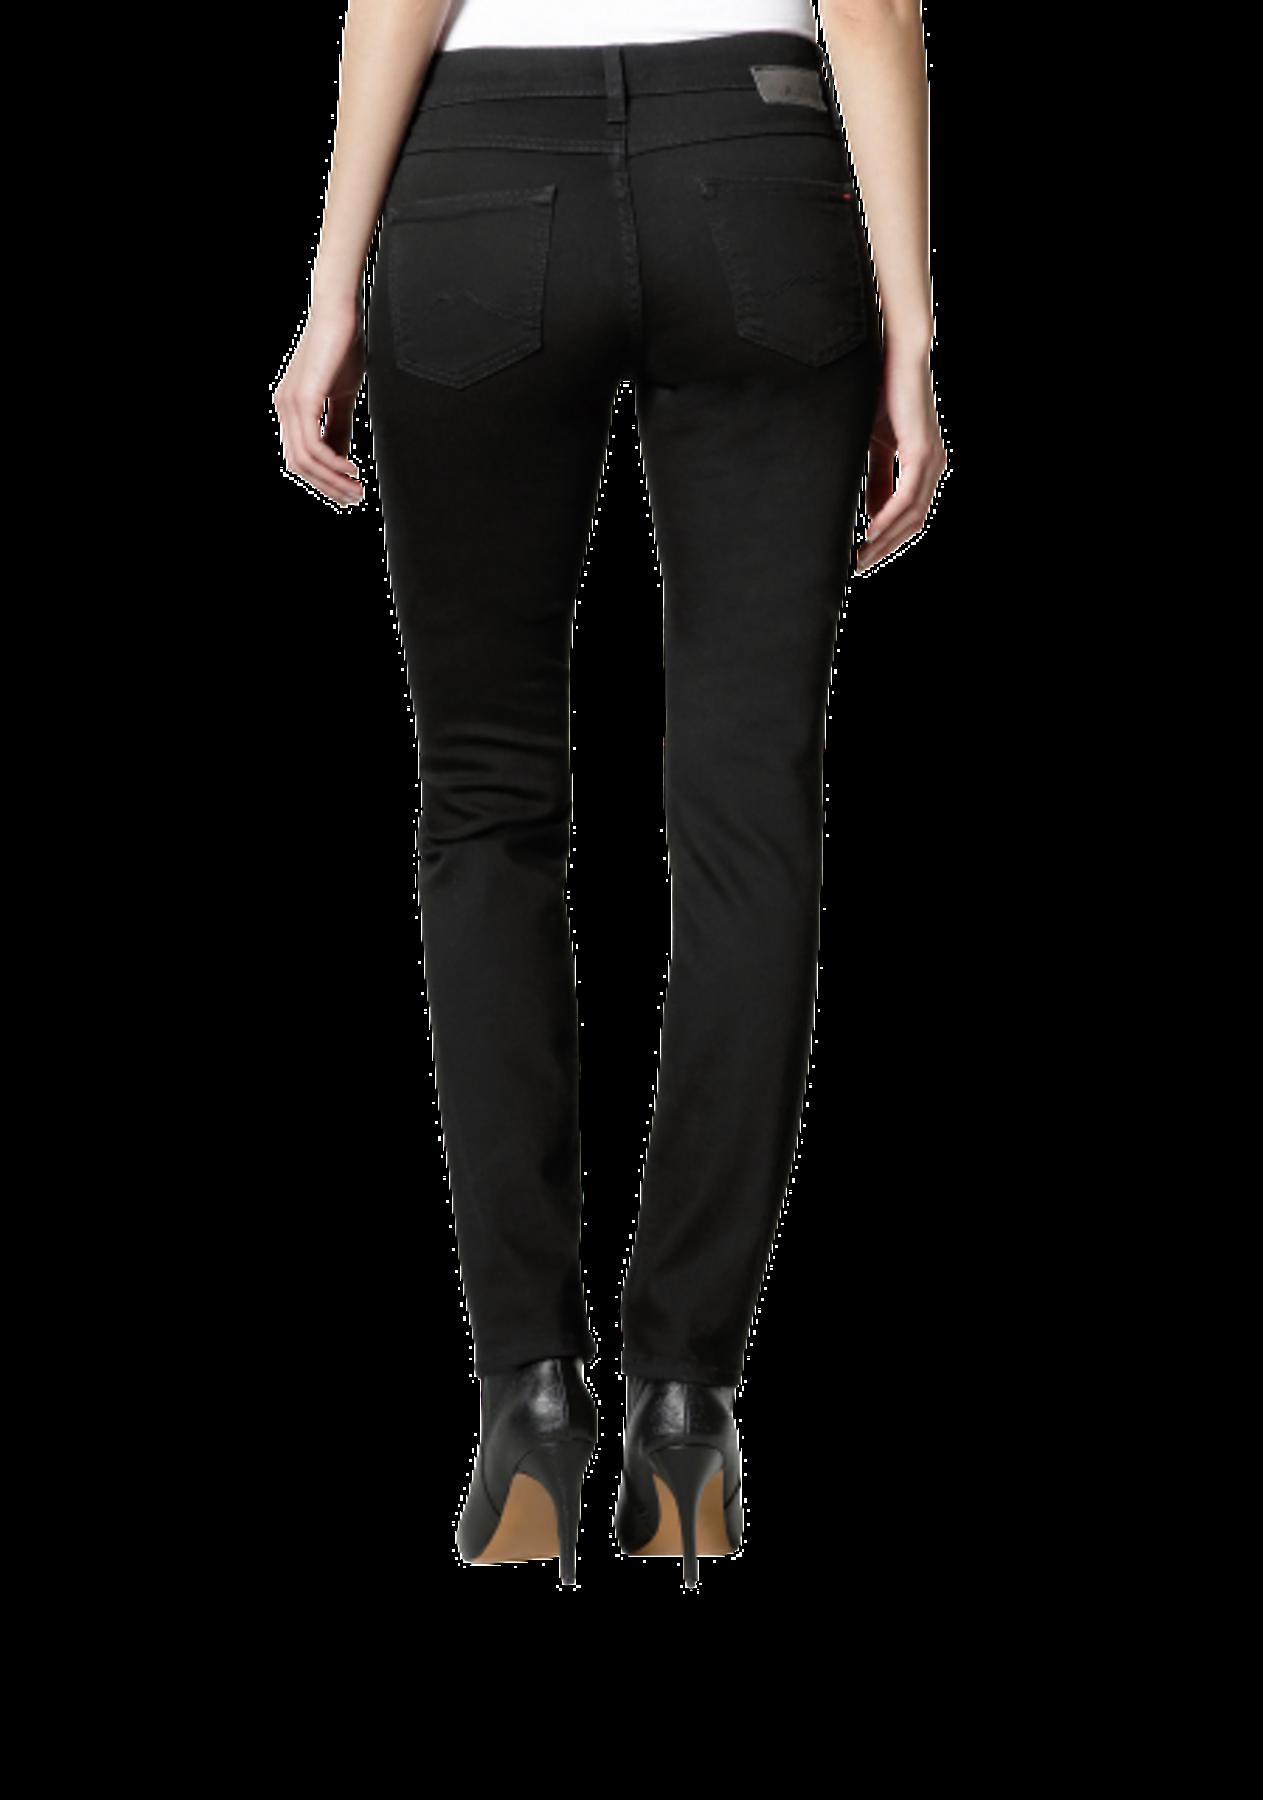 Mustang - Slim Leg/Medium Rise - Damen Jeans Hose in Schwarz (midnight black), Jasmin Slim (586-5174-490) – Bild 3